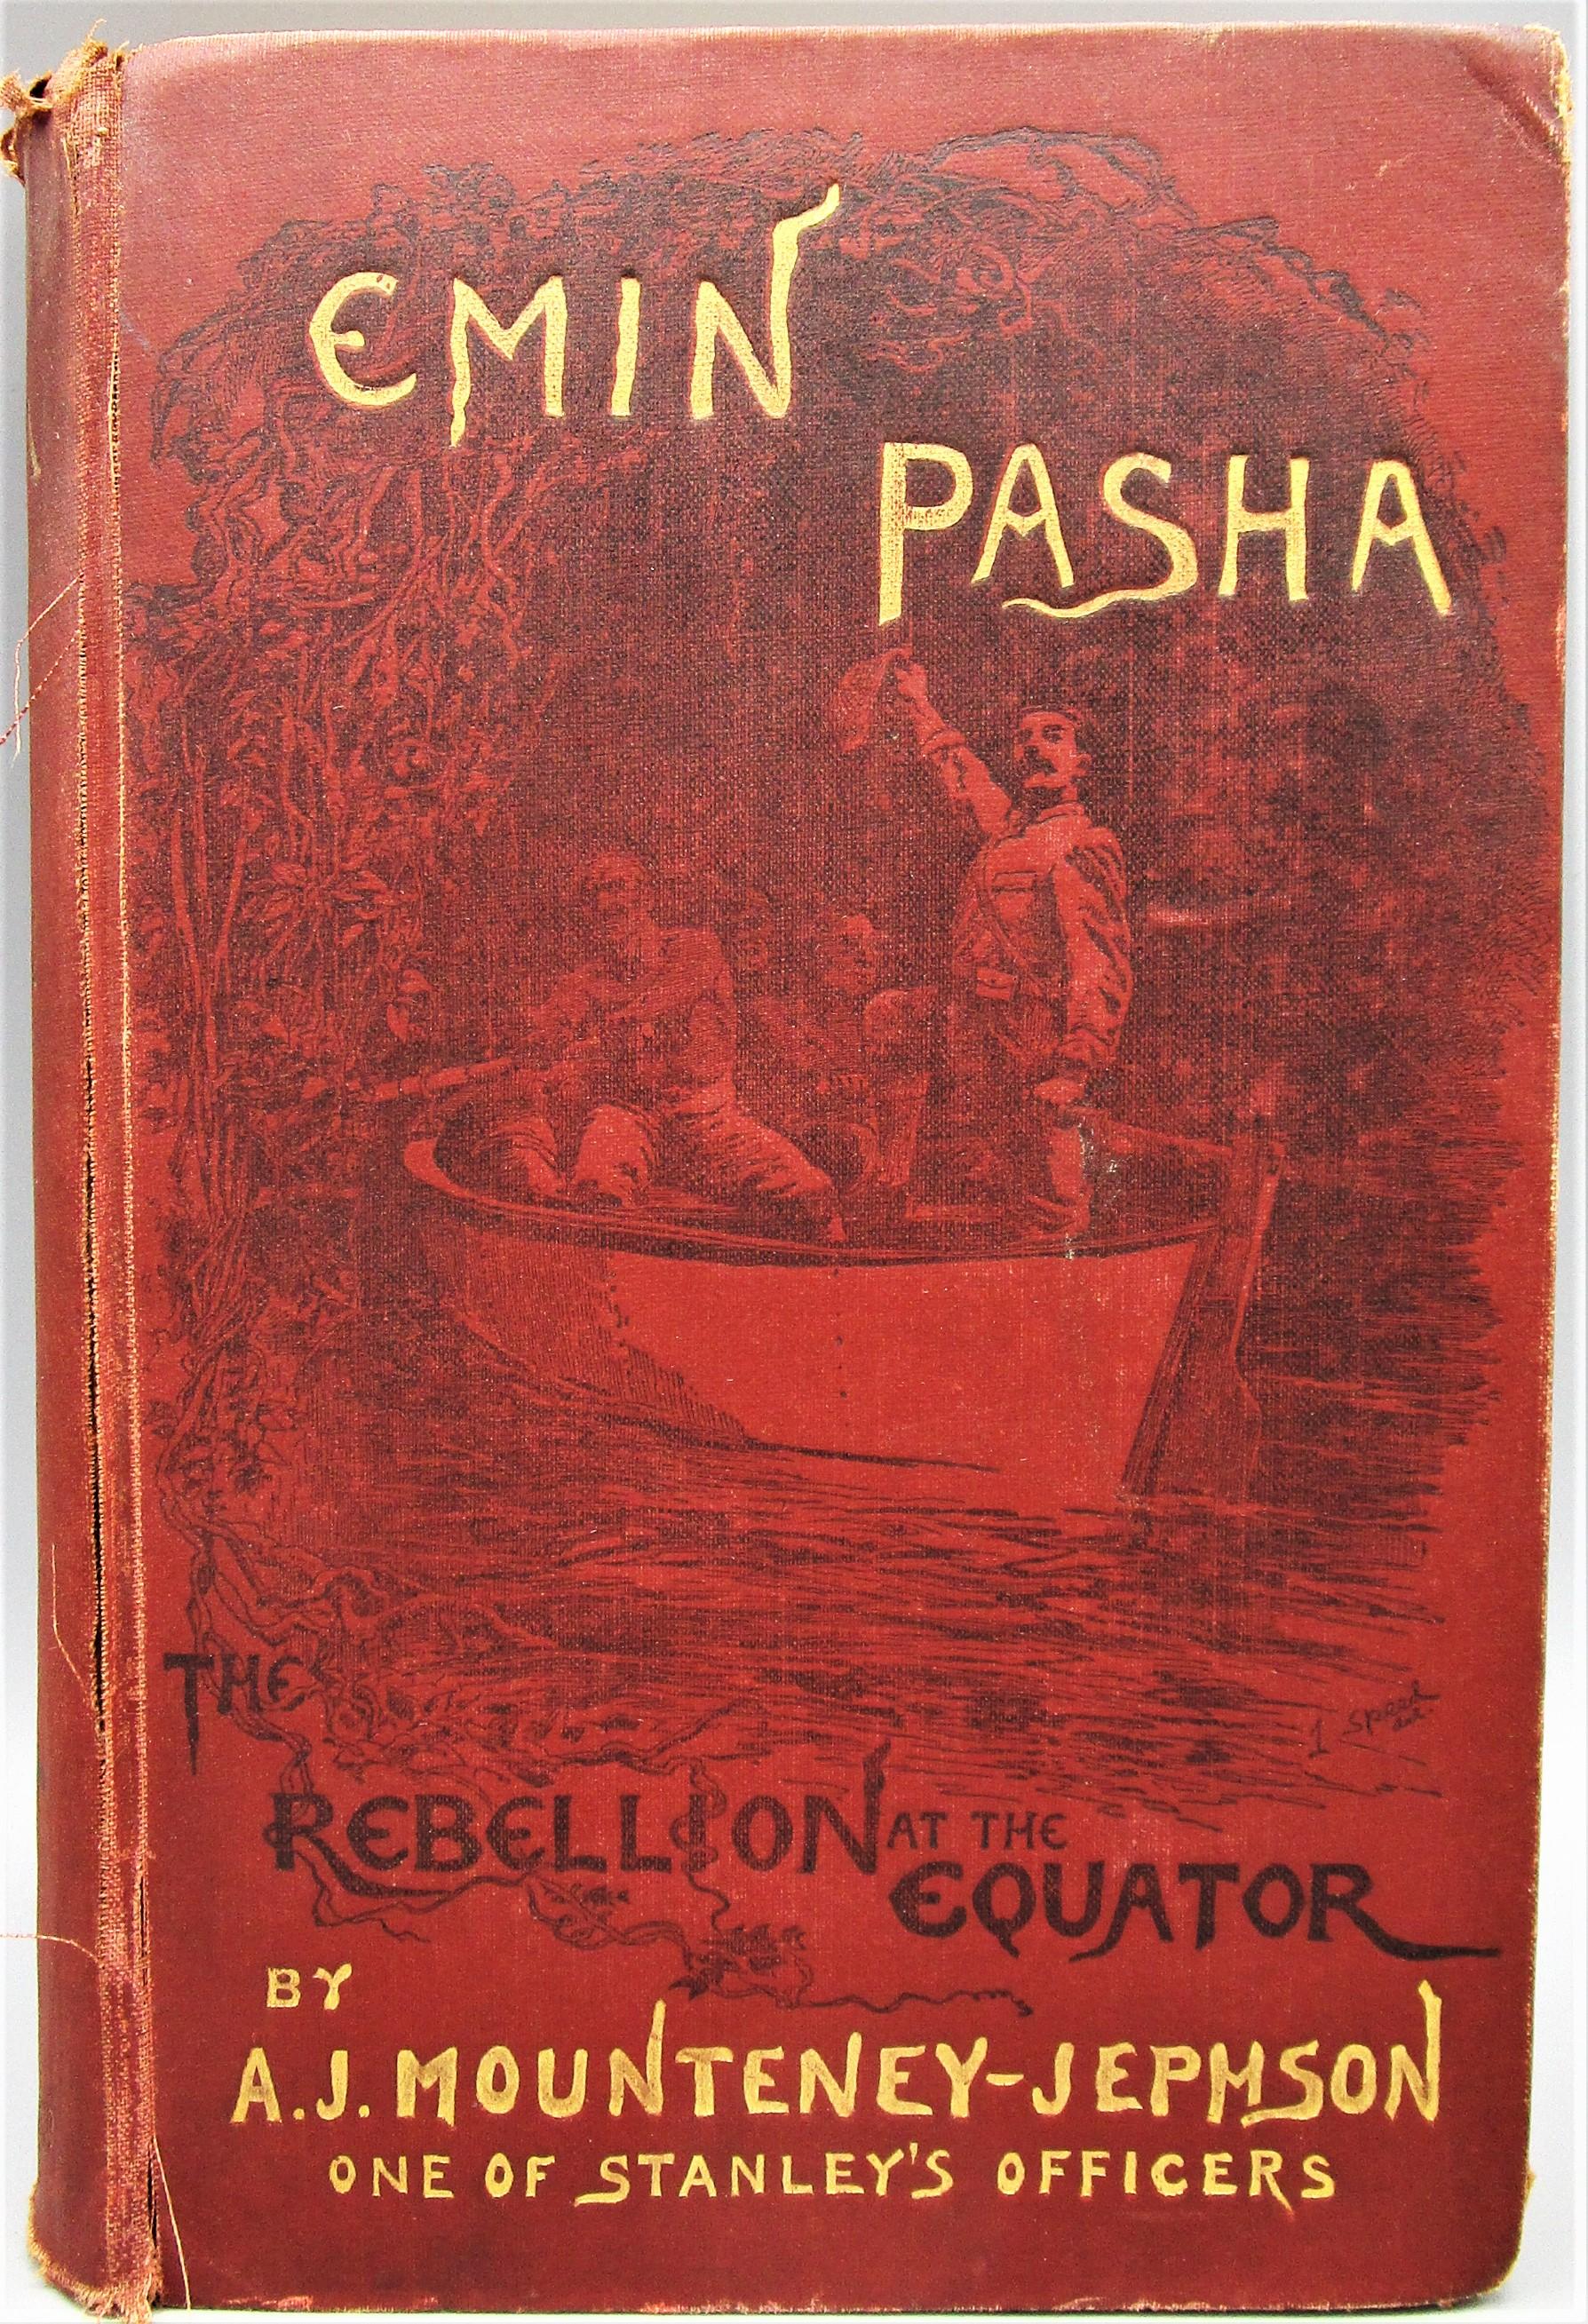 EMIN PASHA, by A. J. Mounteney-Jephson - 1890 [Signed]